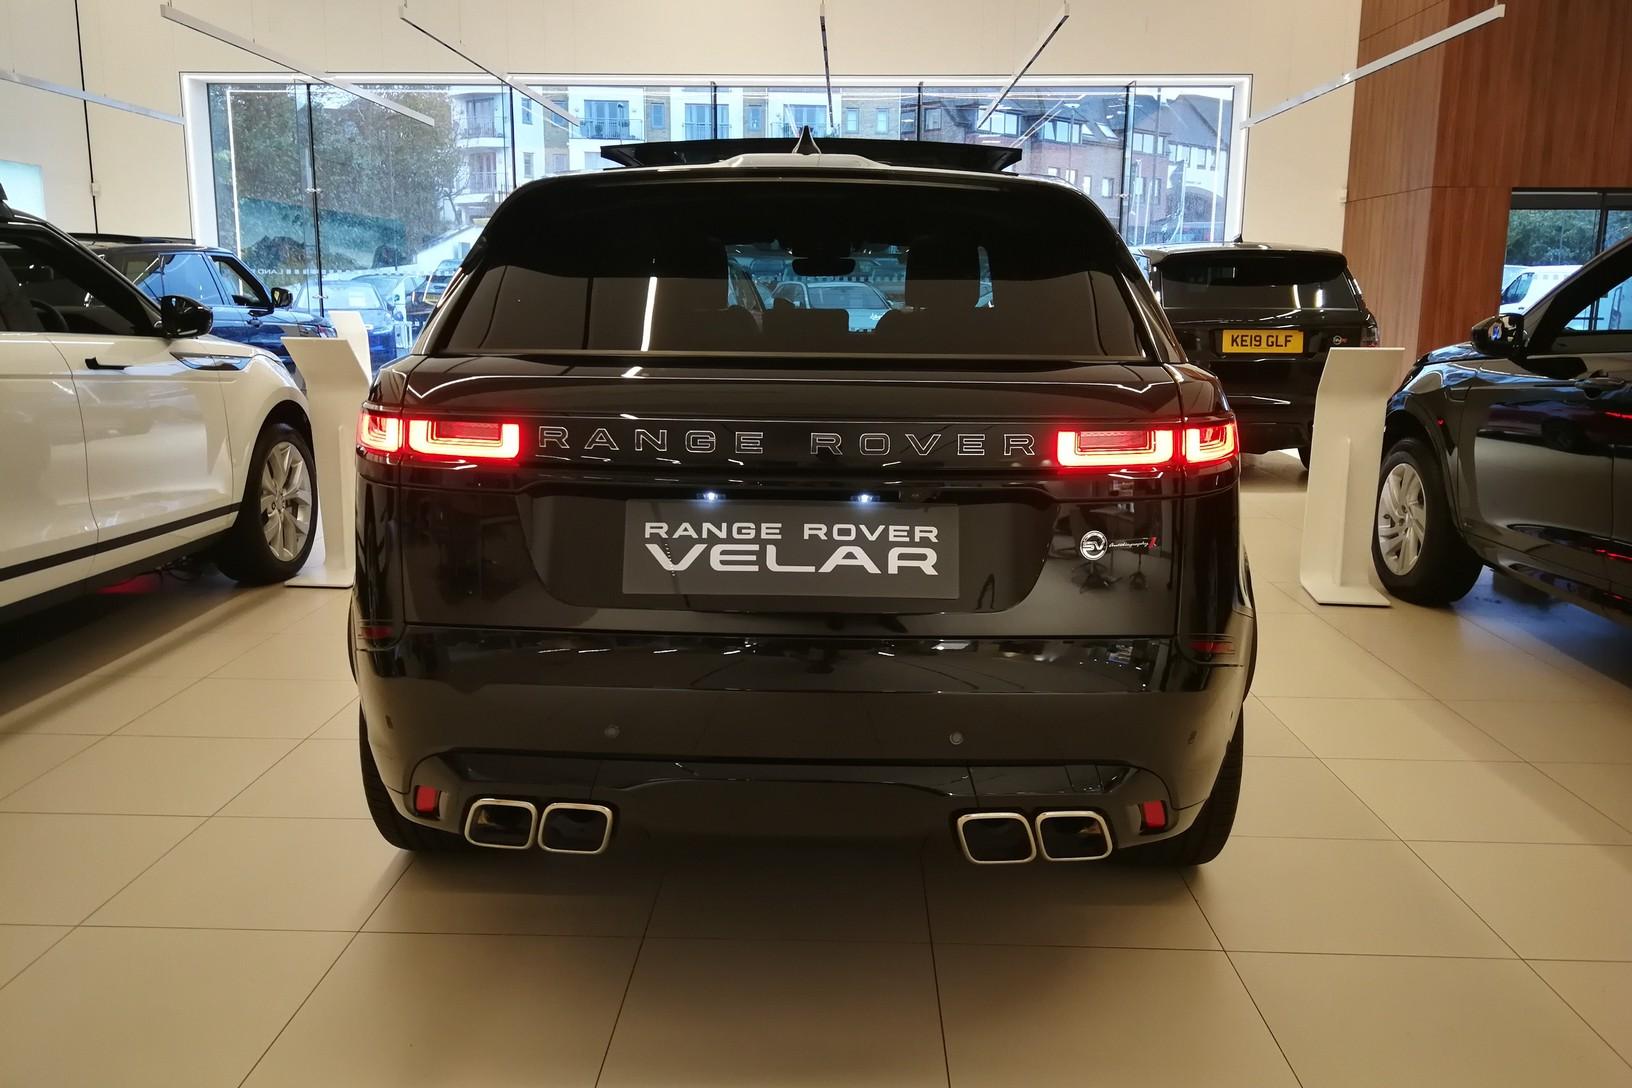 Land Rover Range Rover Velar 5.0 P550 SVAutobiography Dynamic Edition image 5